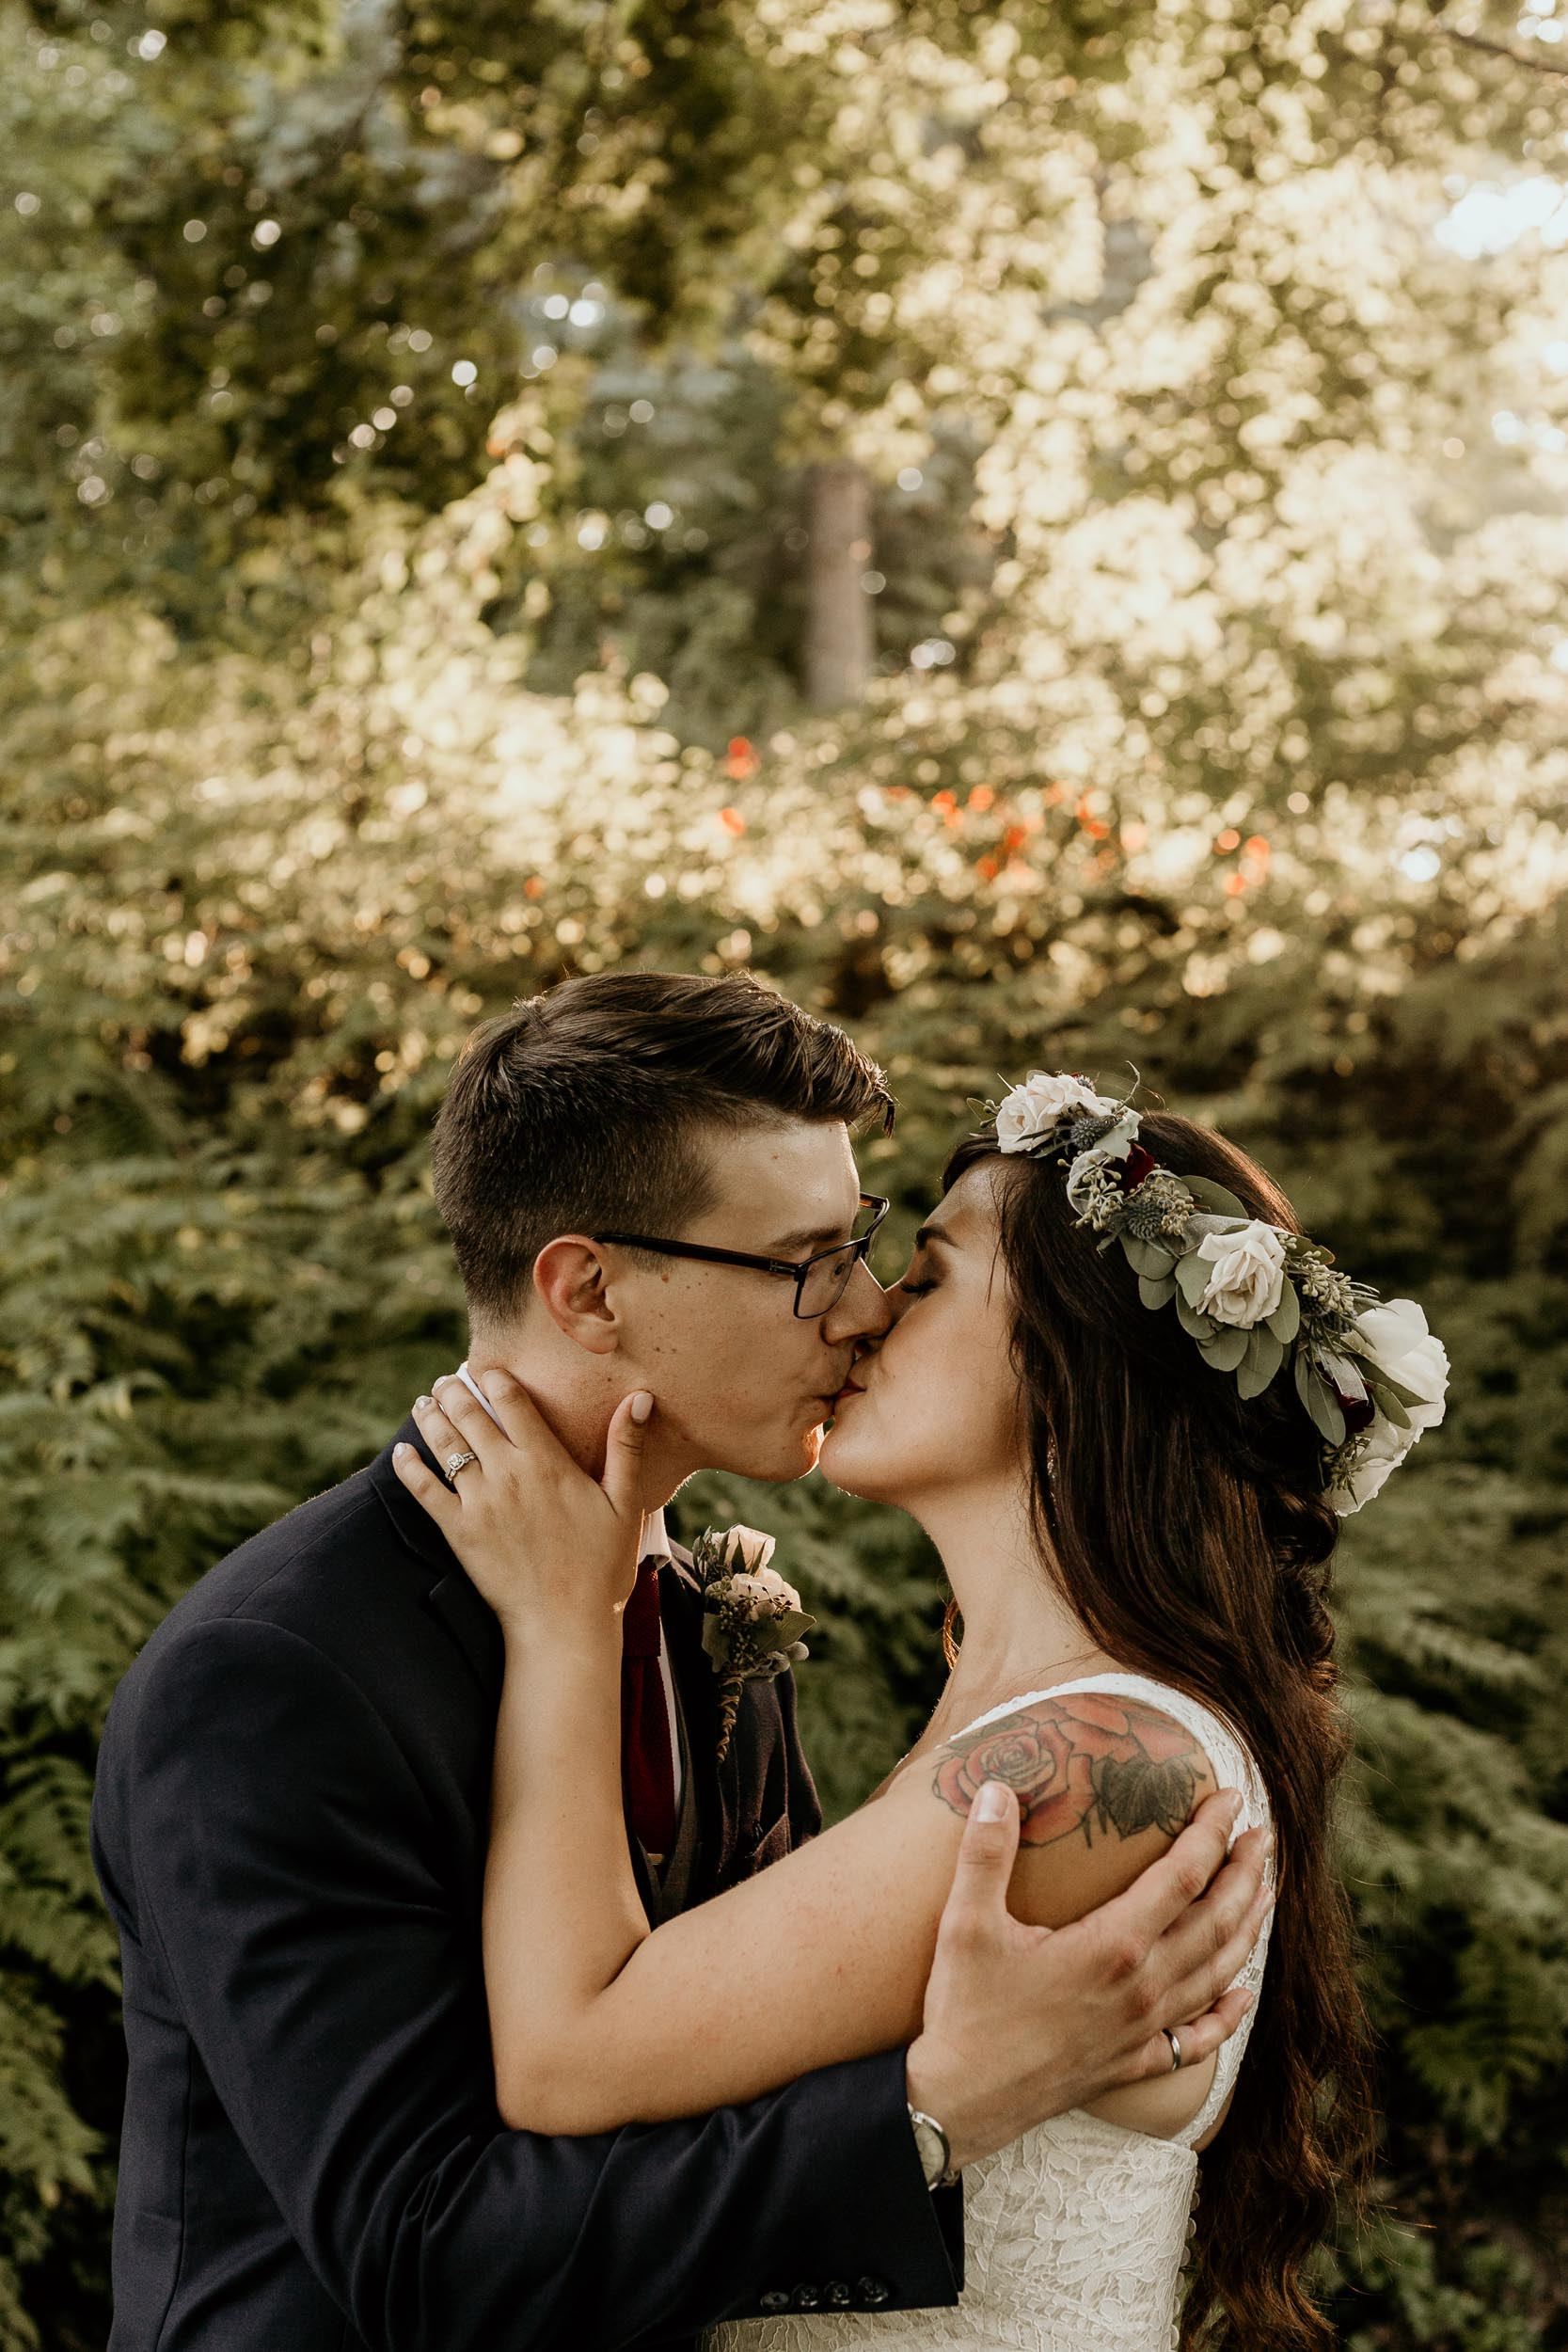 intimate-wedding-elopement-photographer-ottawa-toronto-8062.jpg